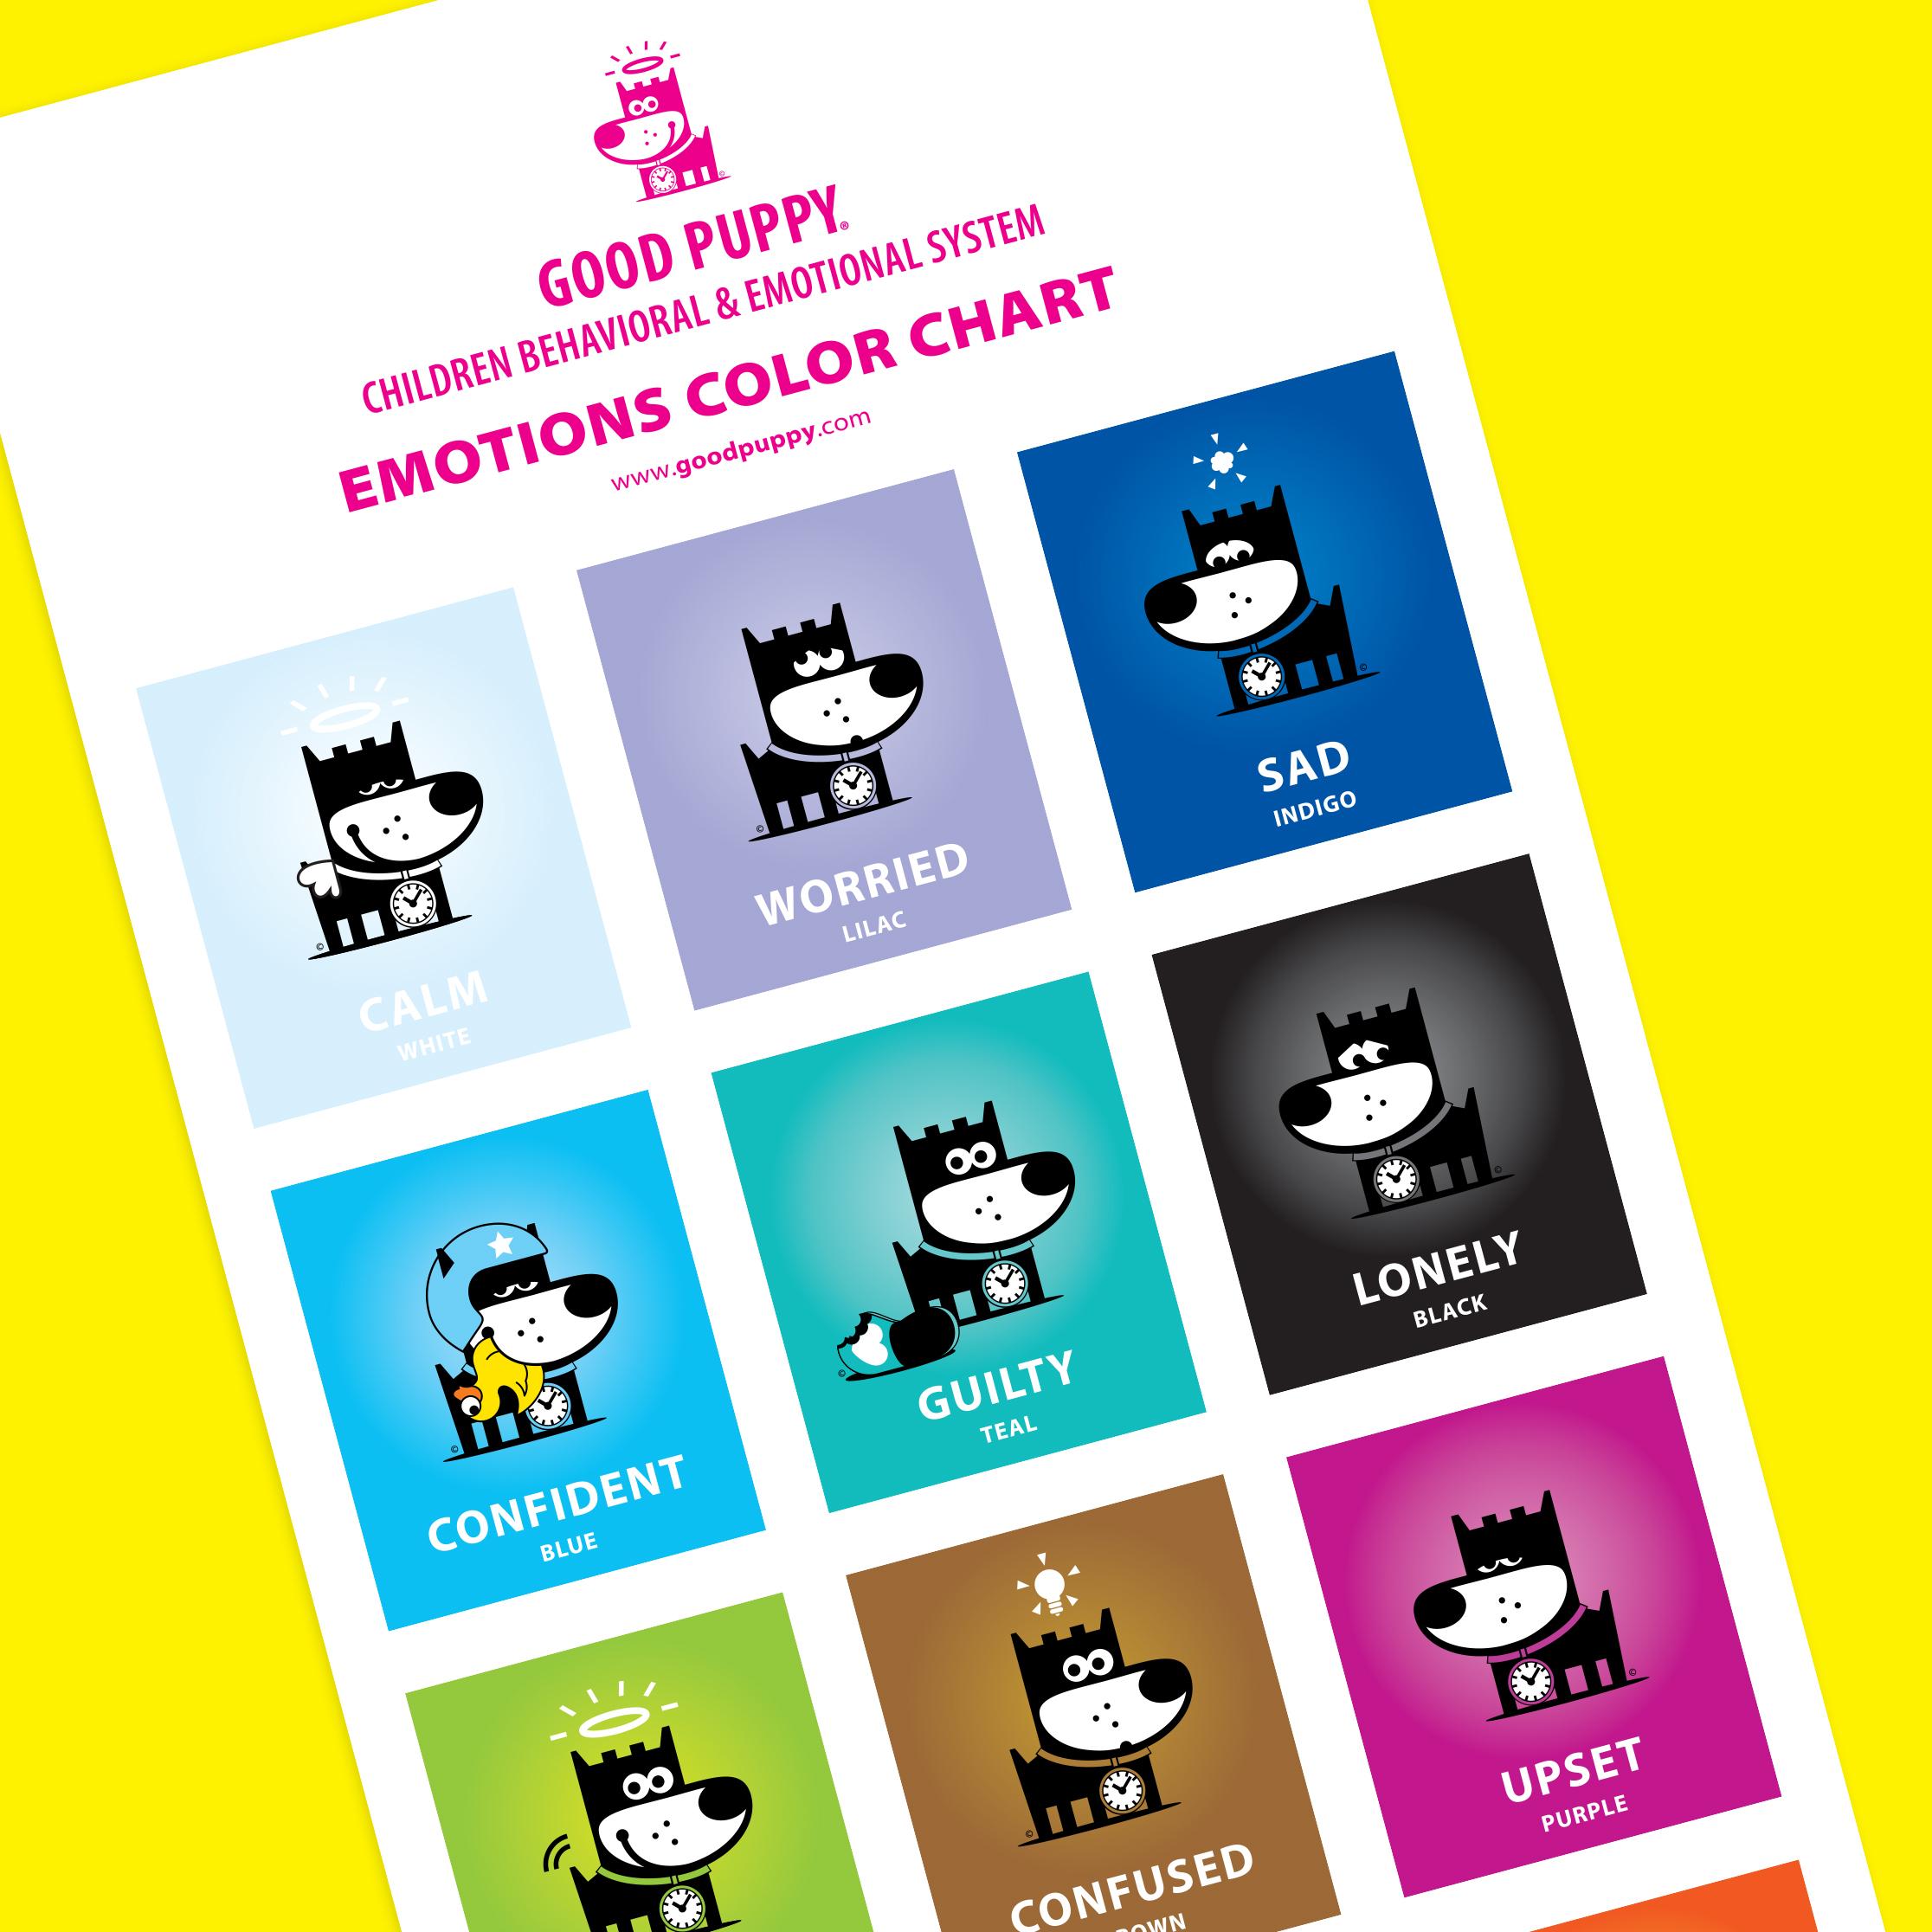 Emotions Color Chart For Children